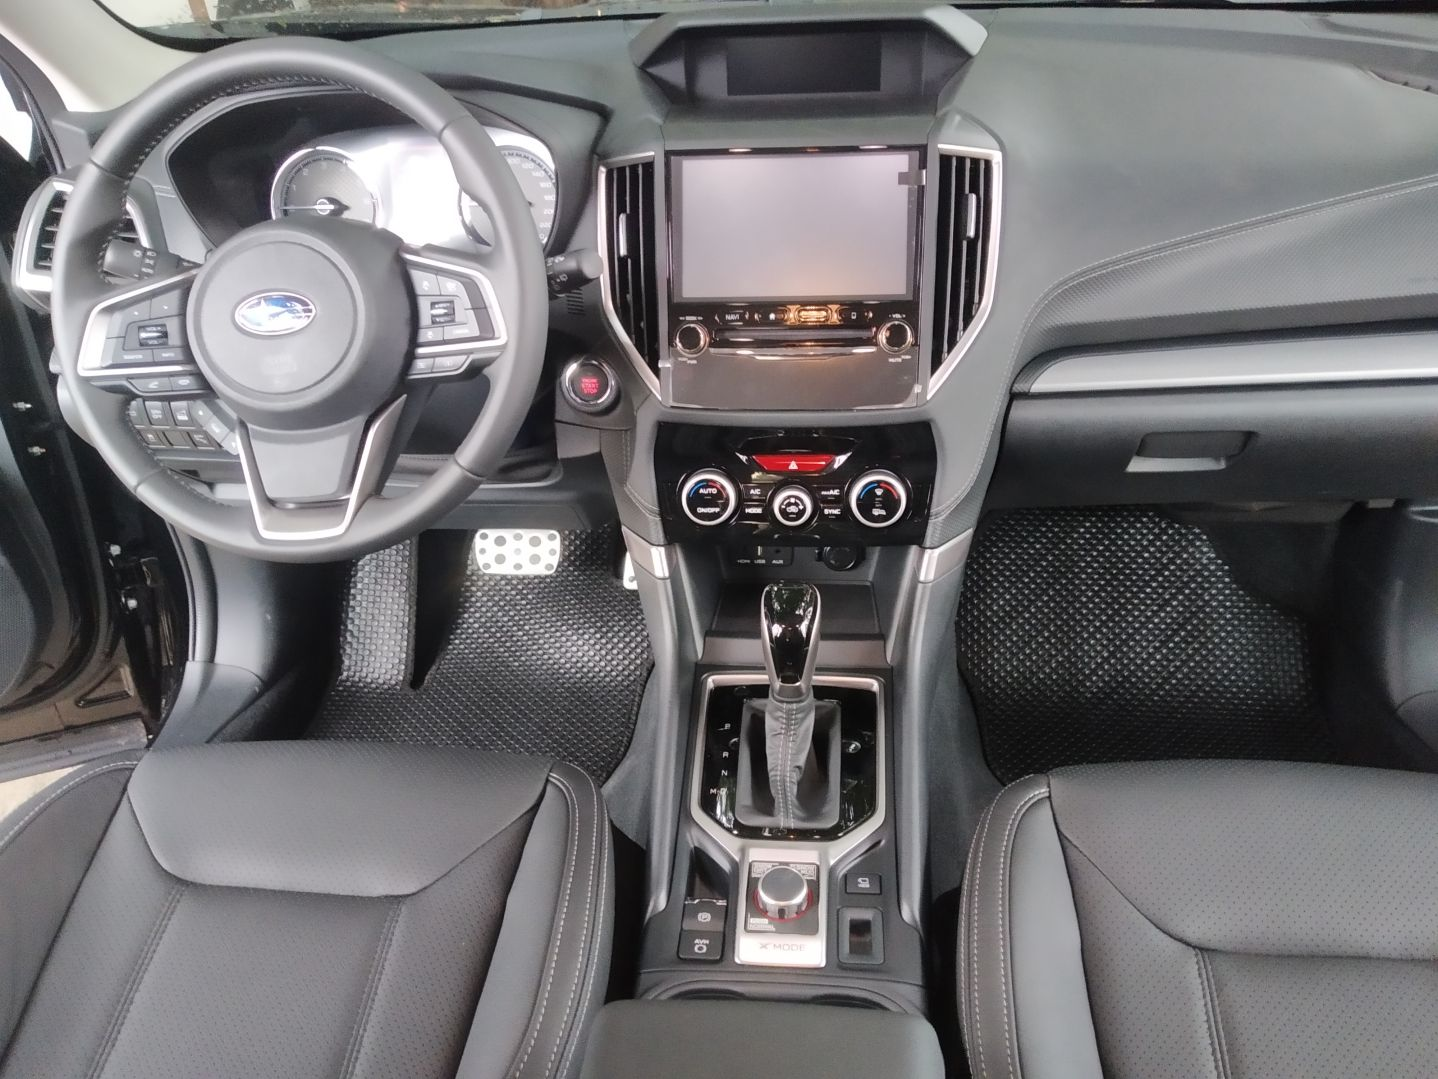 Thảm lót sàn Subaru Forester 2019 đen